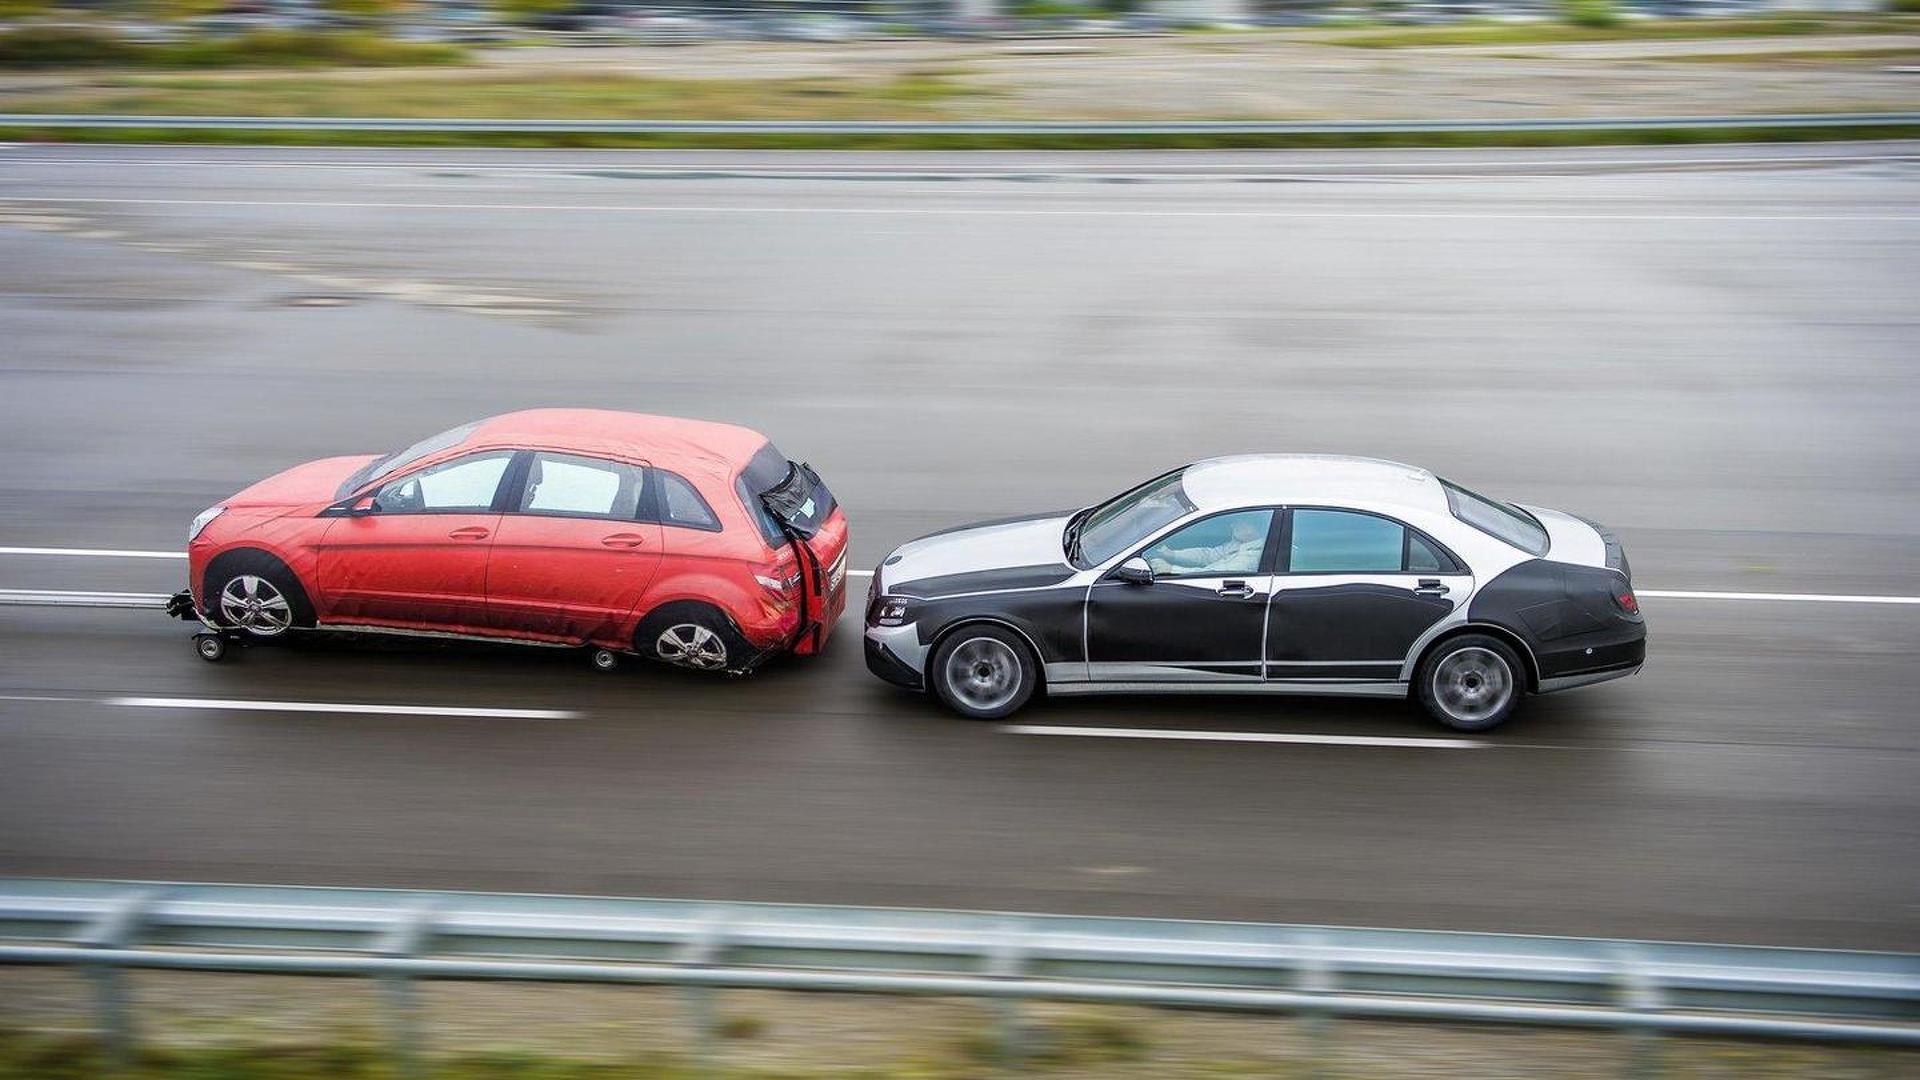 2013 Mercedes-Benz S-Class, confirmed tech details revealed